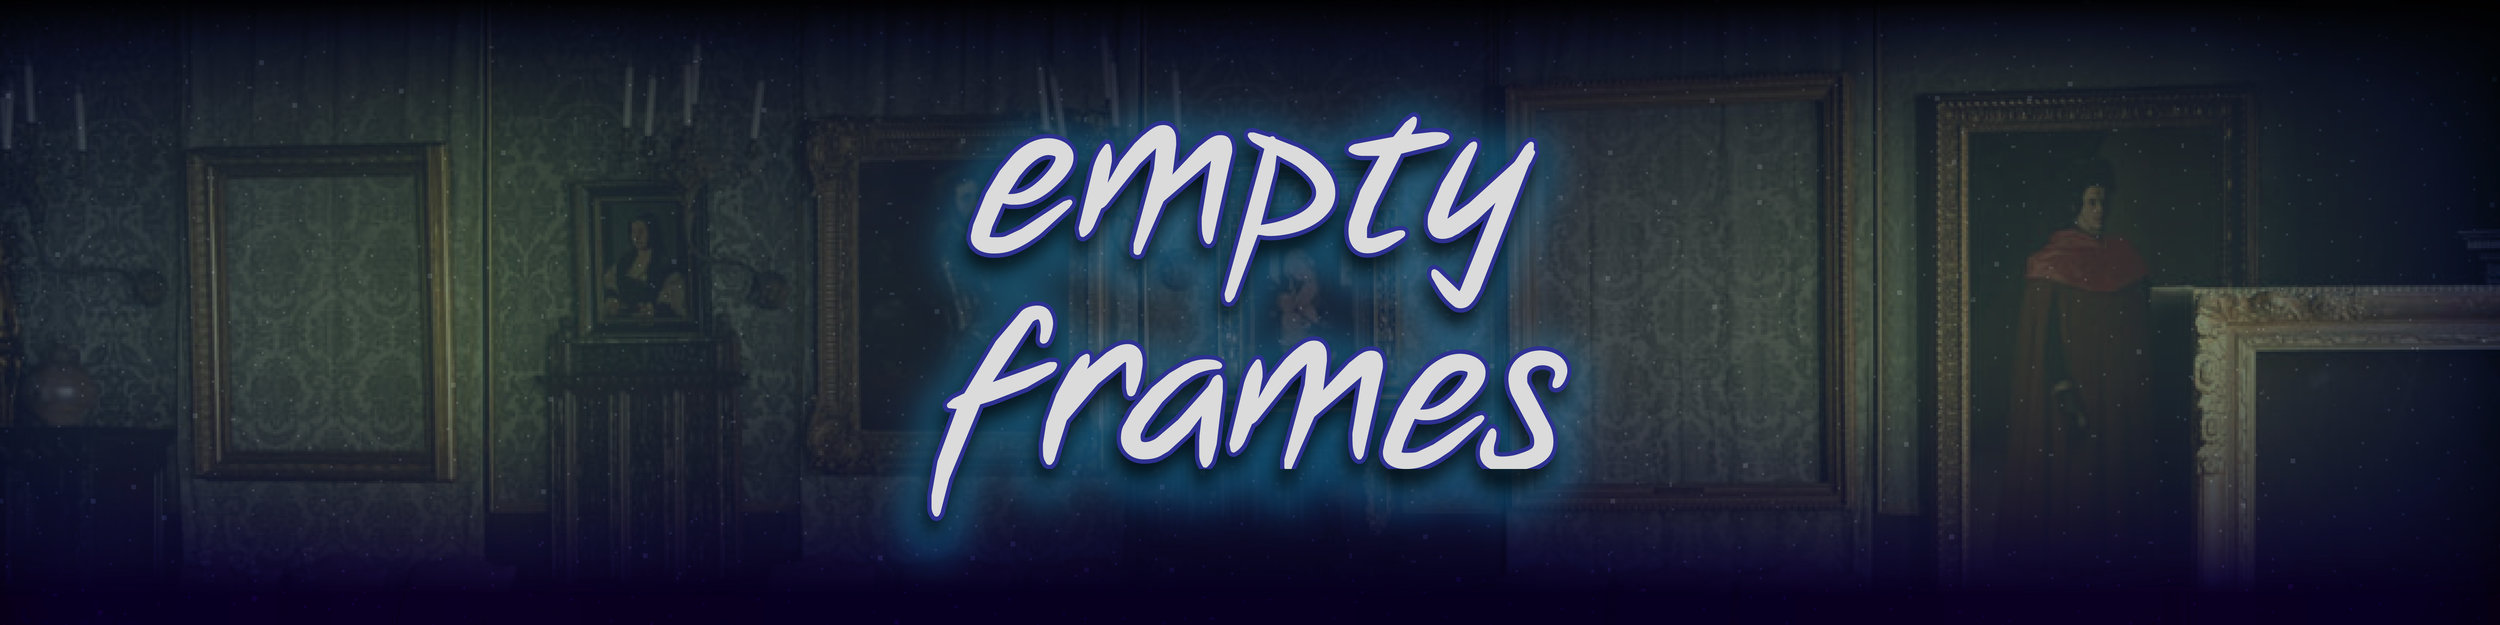 EmptyFrames_1.jpg